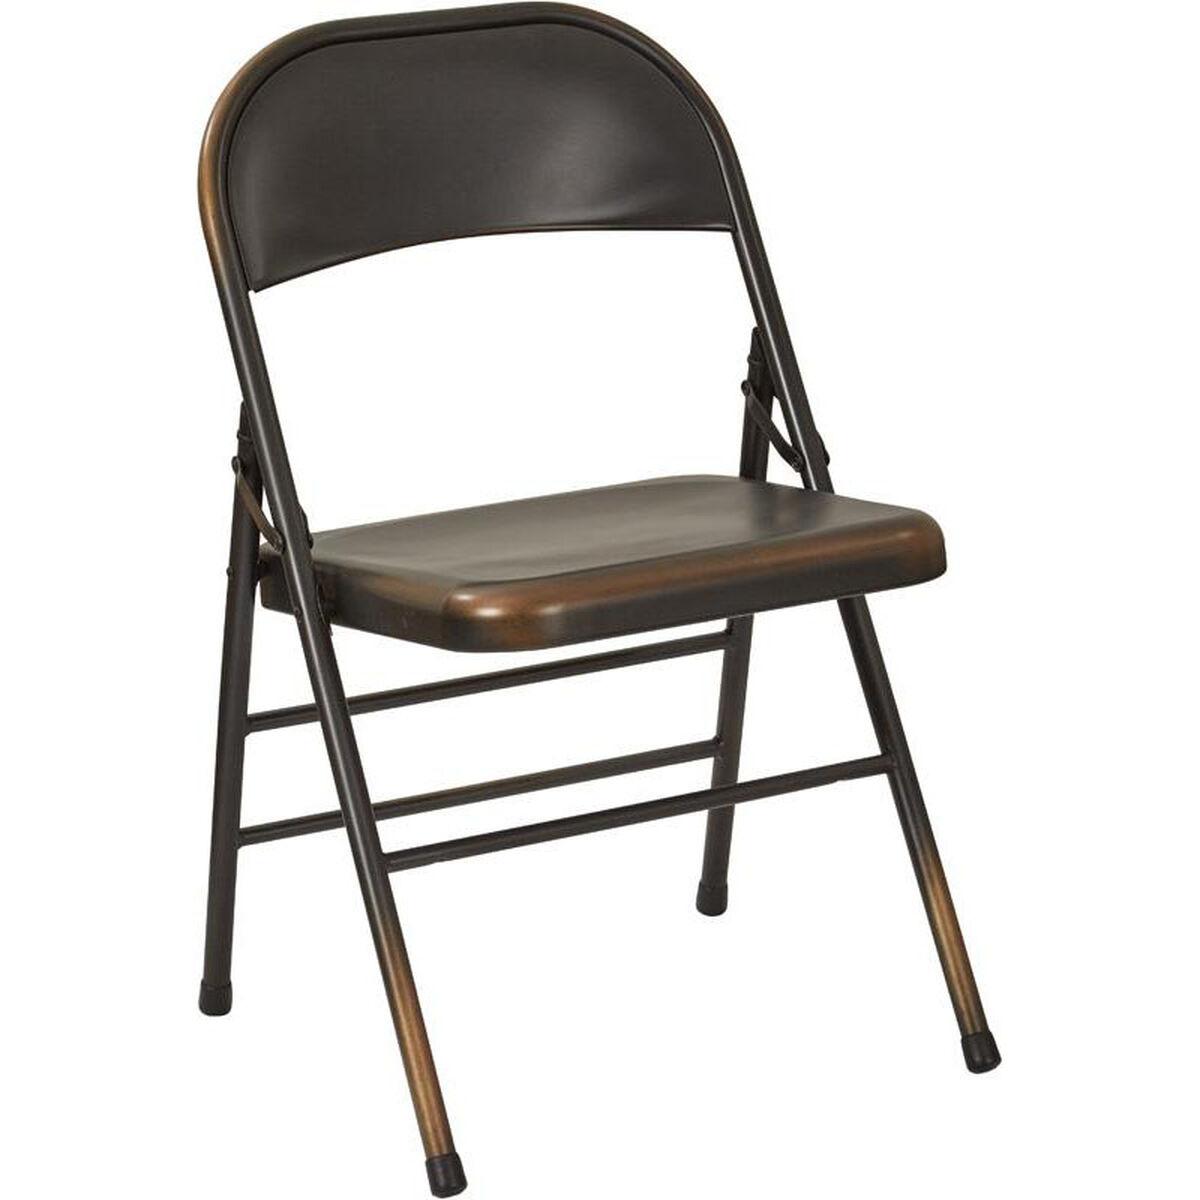 - Www.foldingchairs4less.com/dw/image/v2/BBSJ_PRD/on...